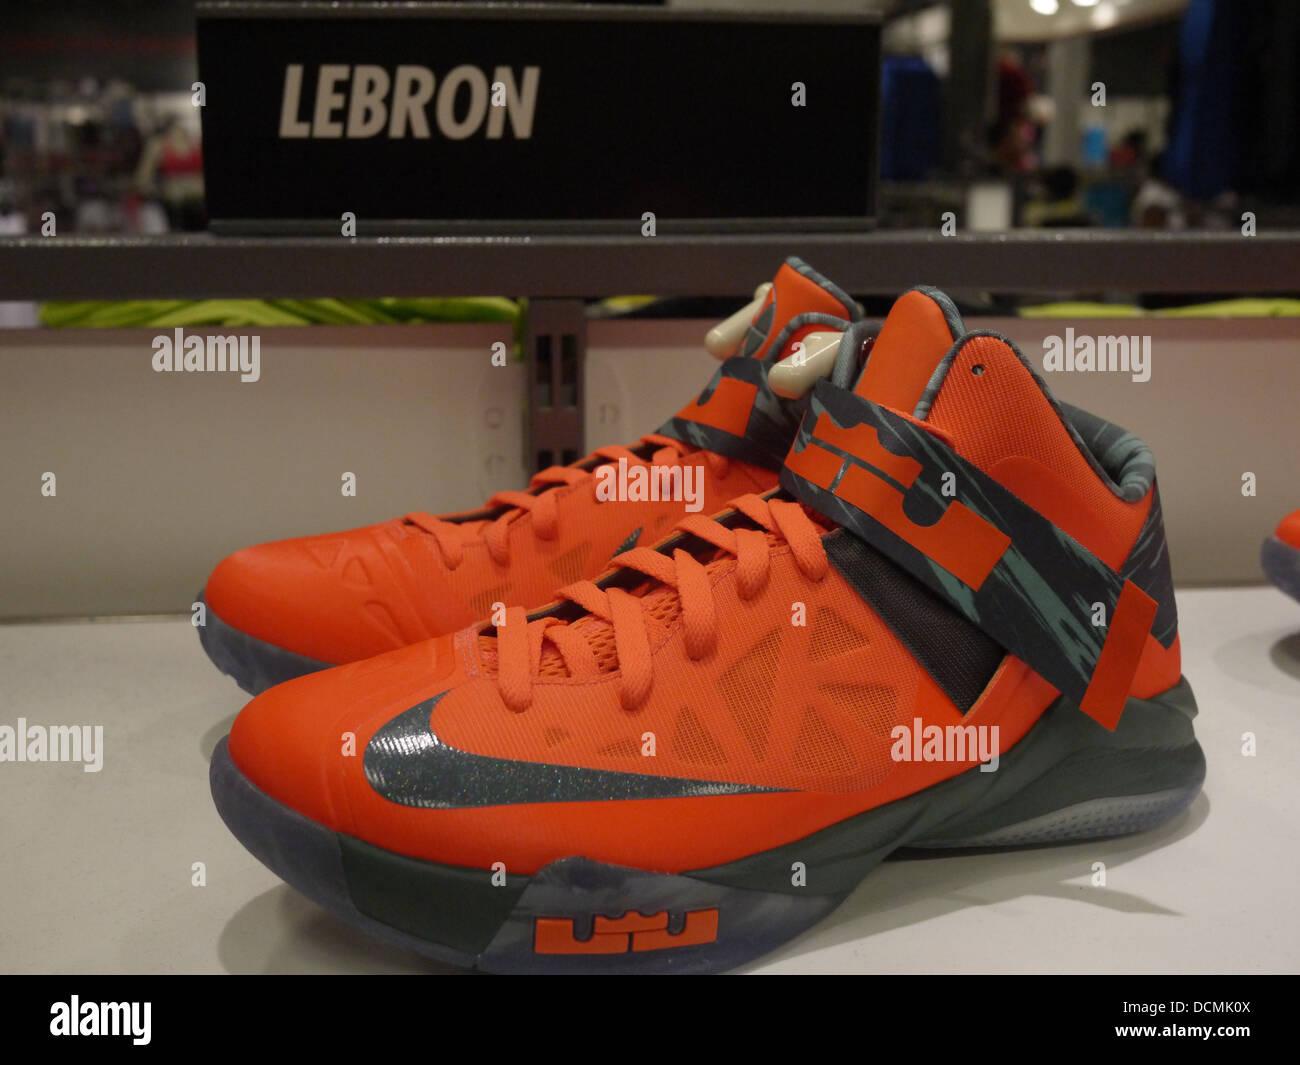 LeBron Signature Nike Basketball-Schuh Stockbild